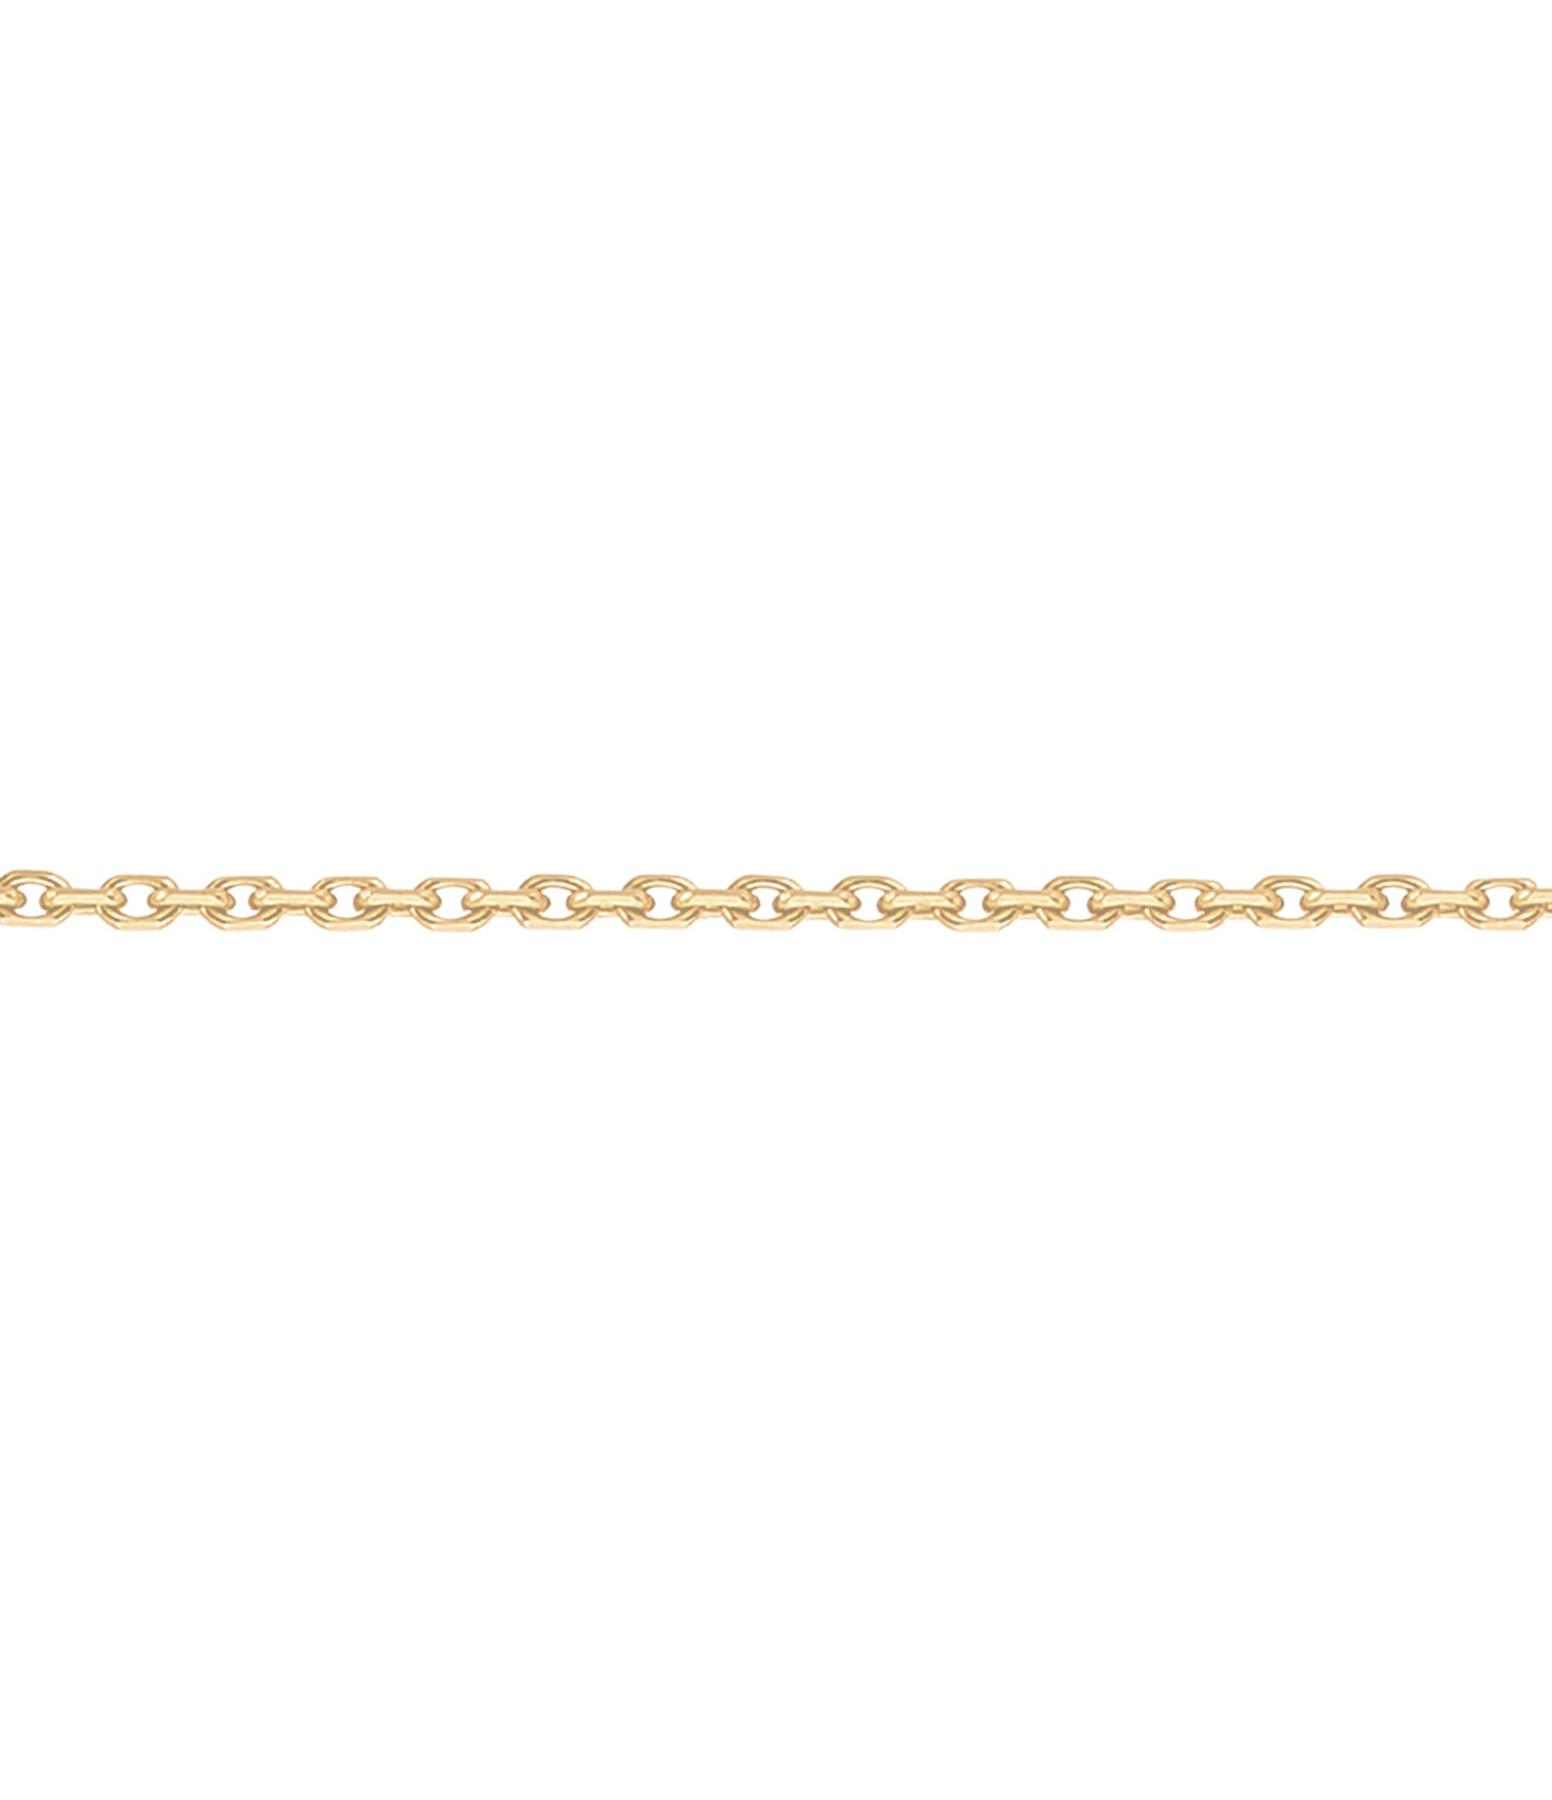 Chaîne Forçat Or Diamantée 45 cm - Or rose - Stone